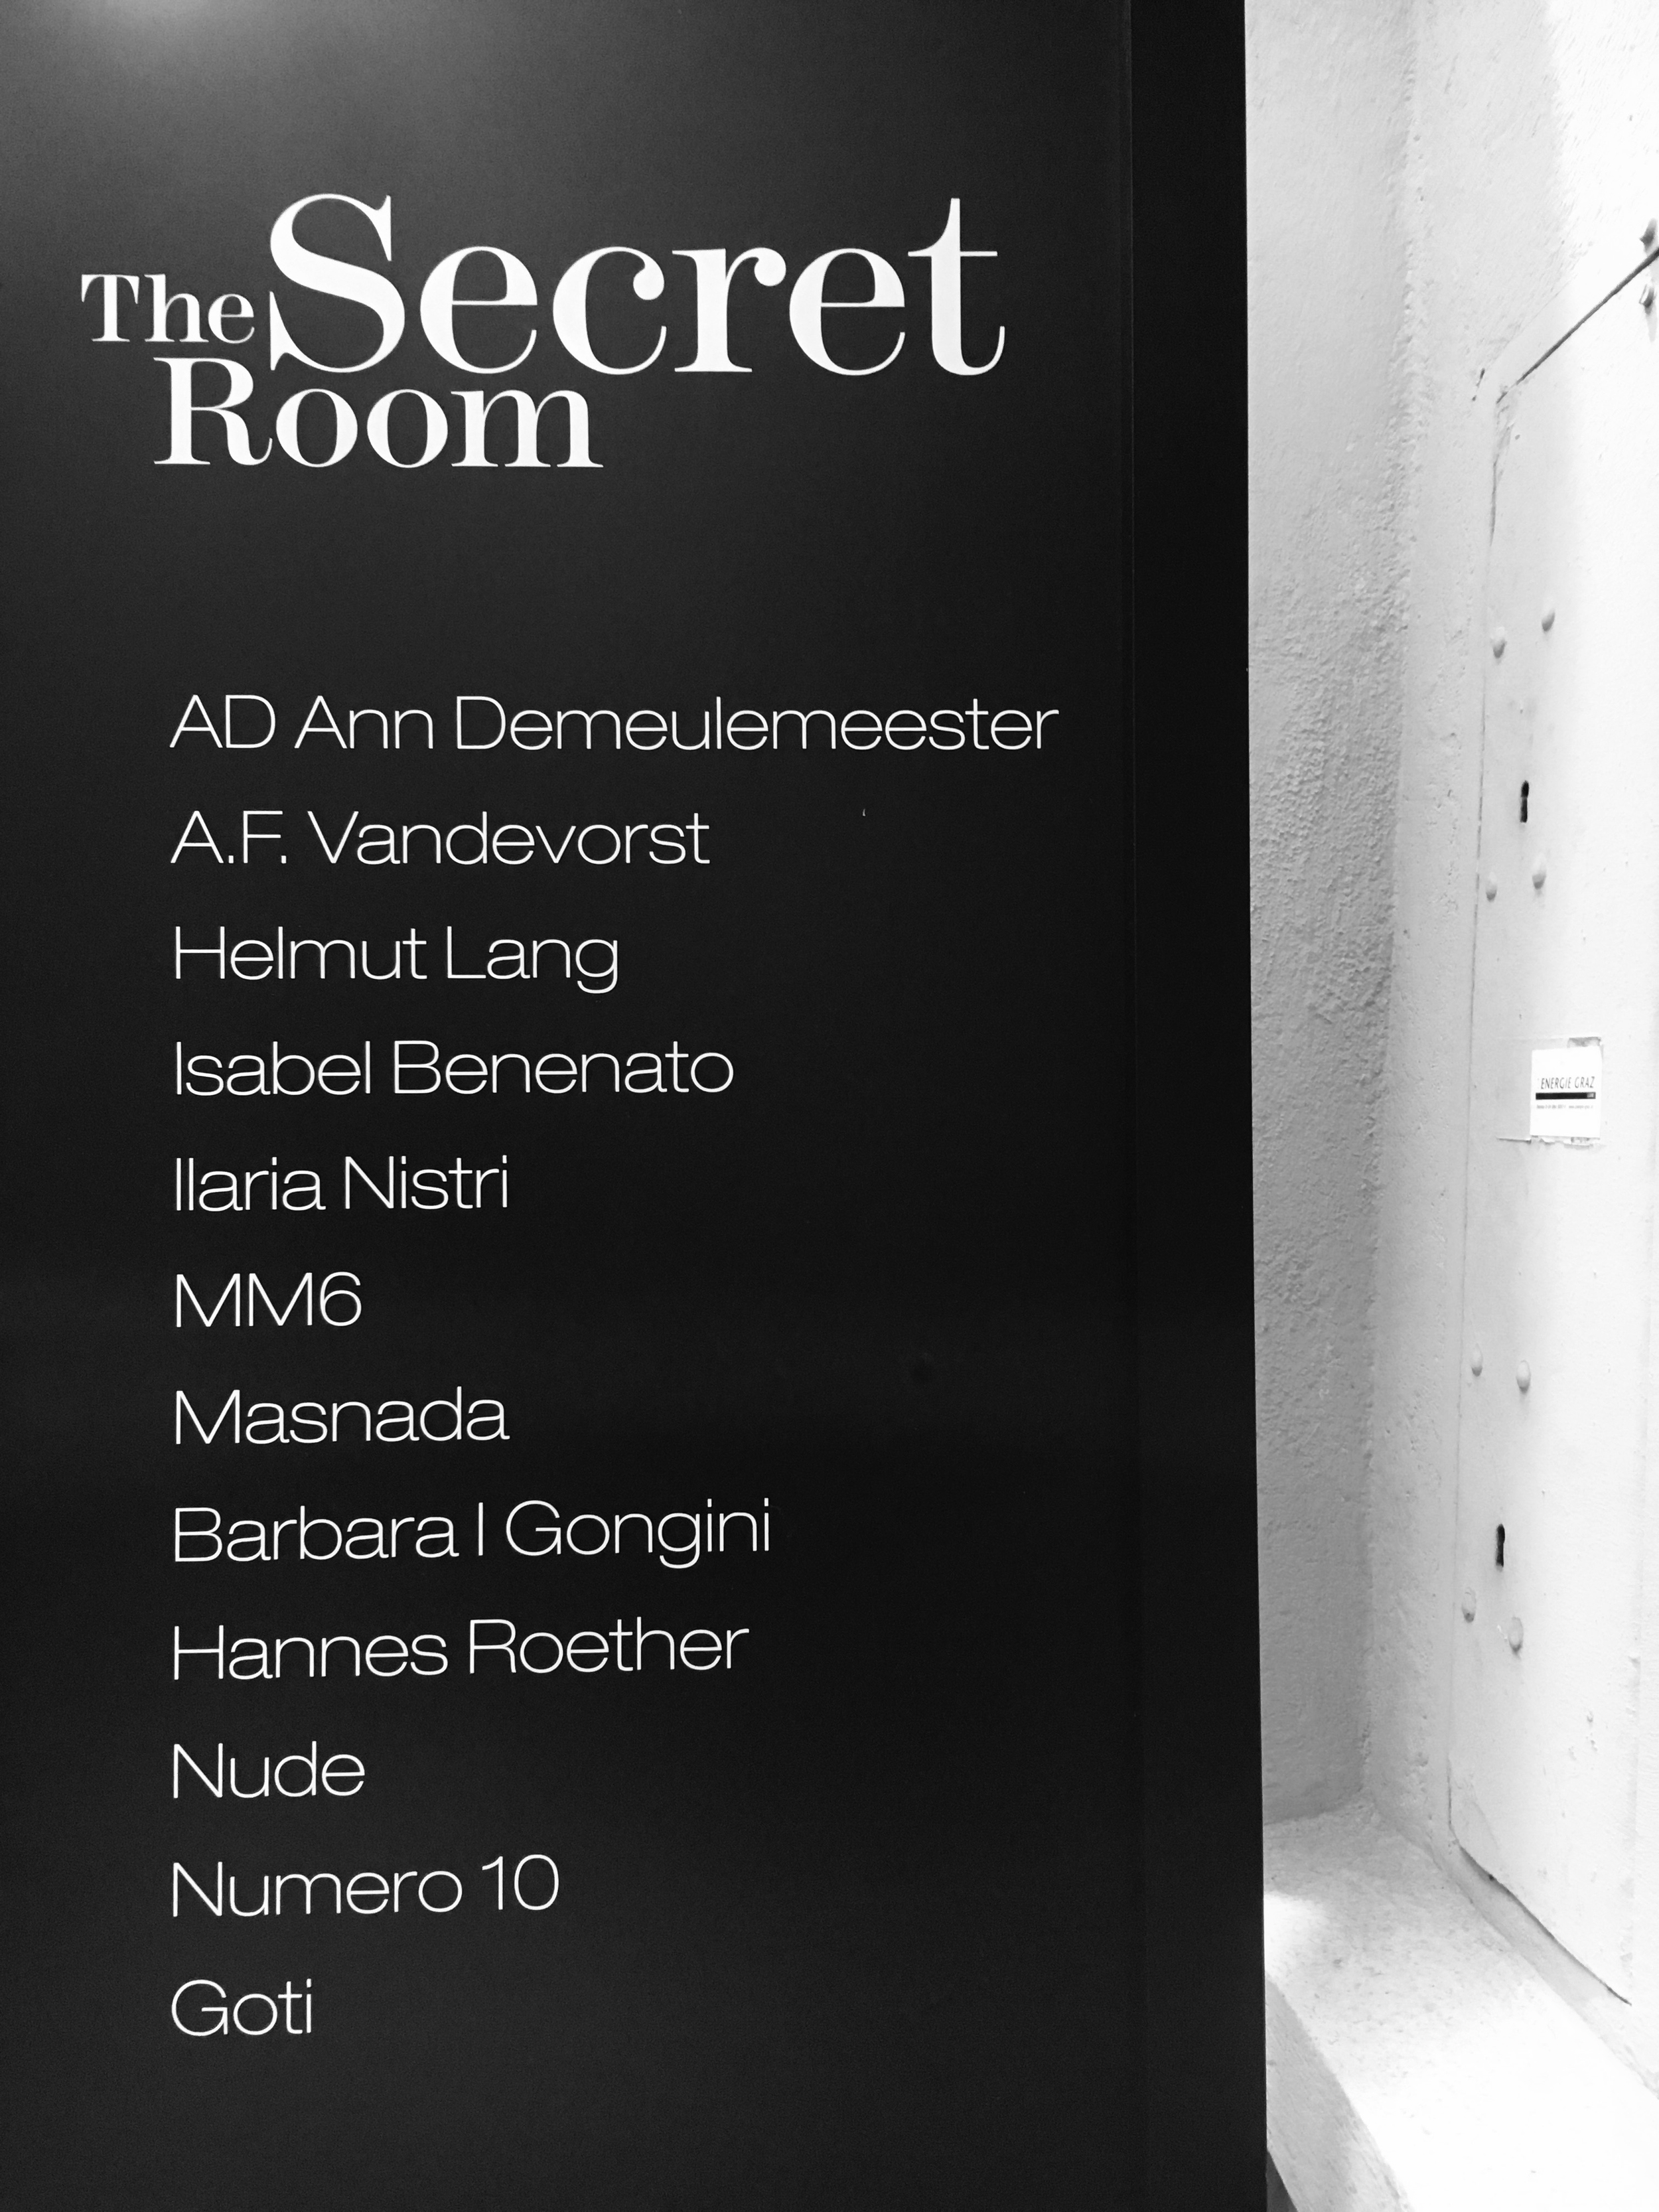 Secret Room - Katharina Purkarthofer - 3.jpg